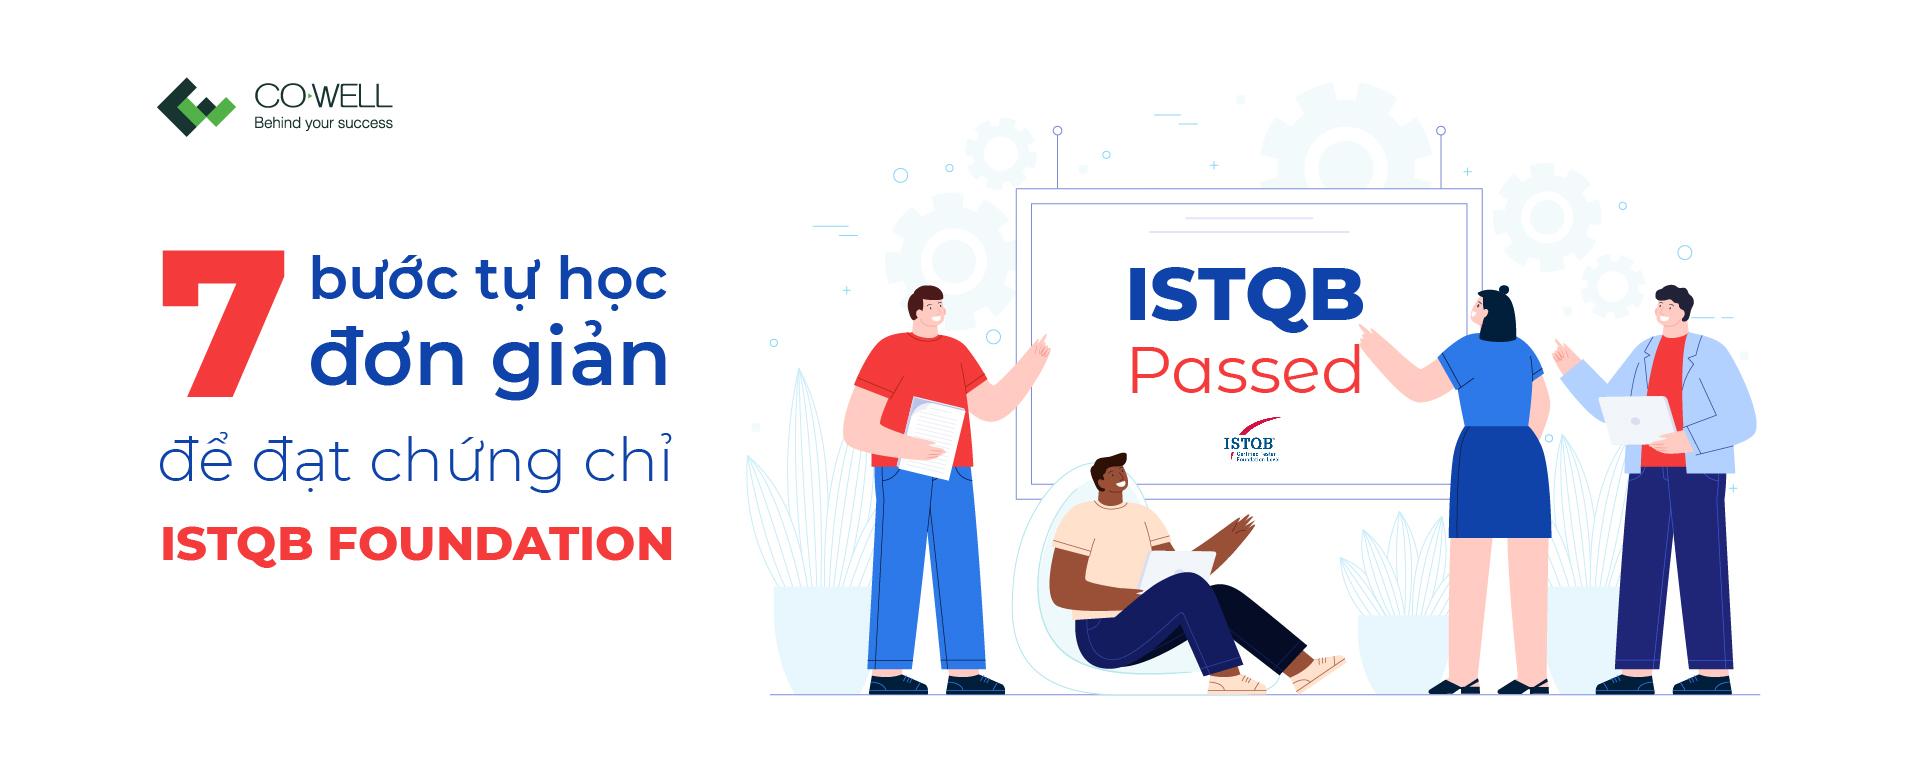 ISTQB banner